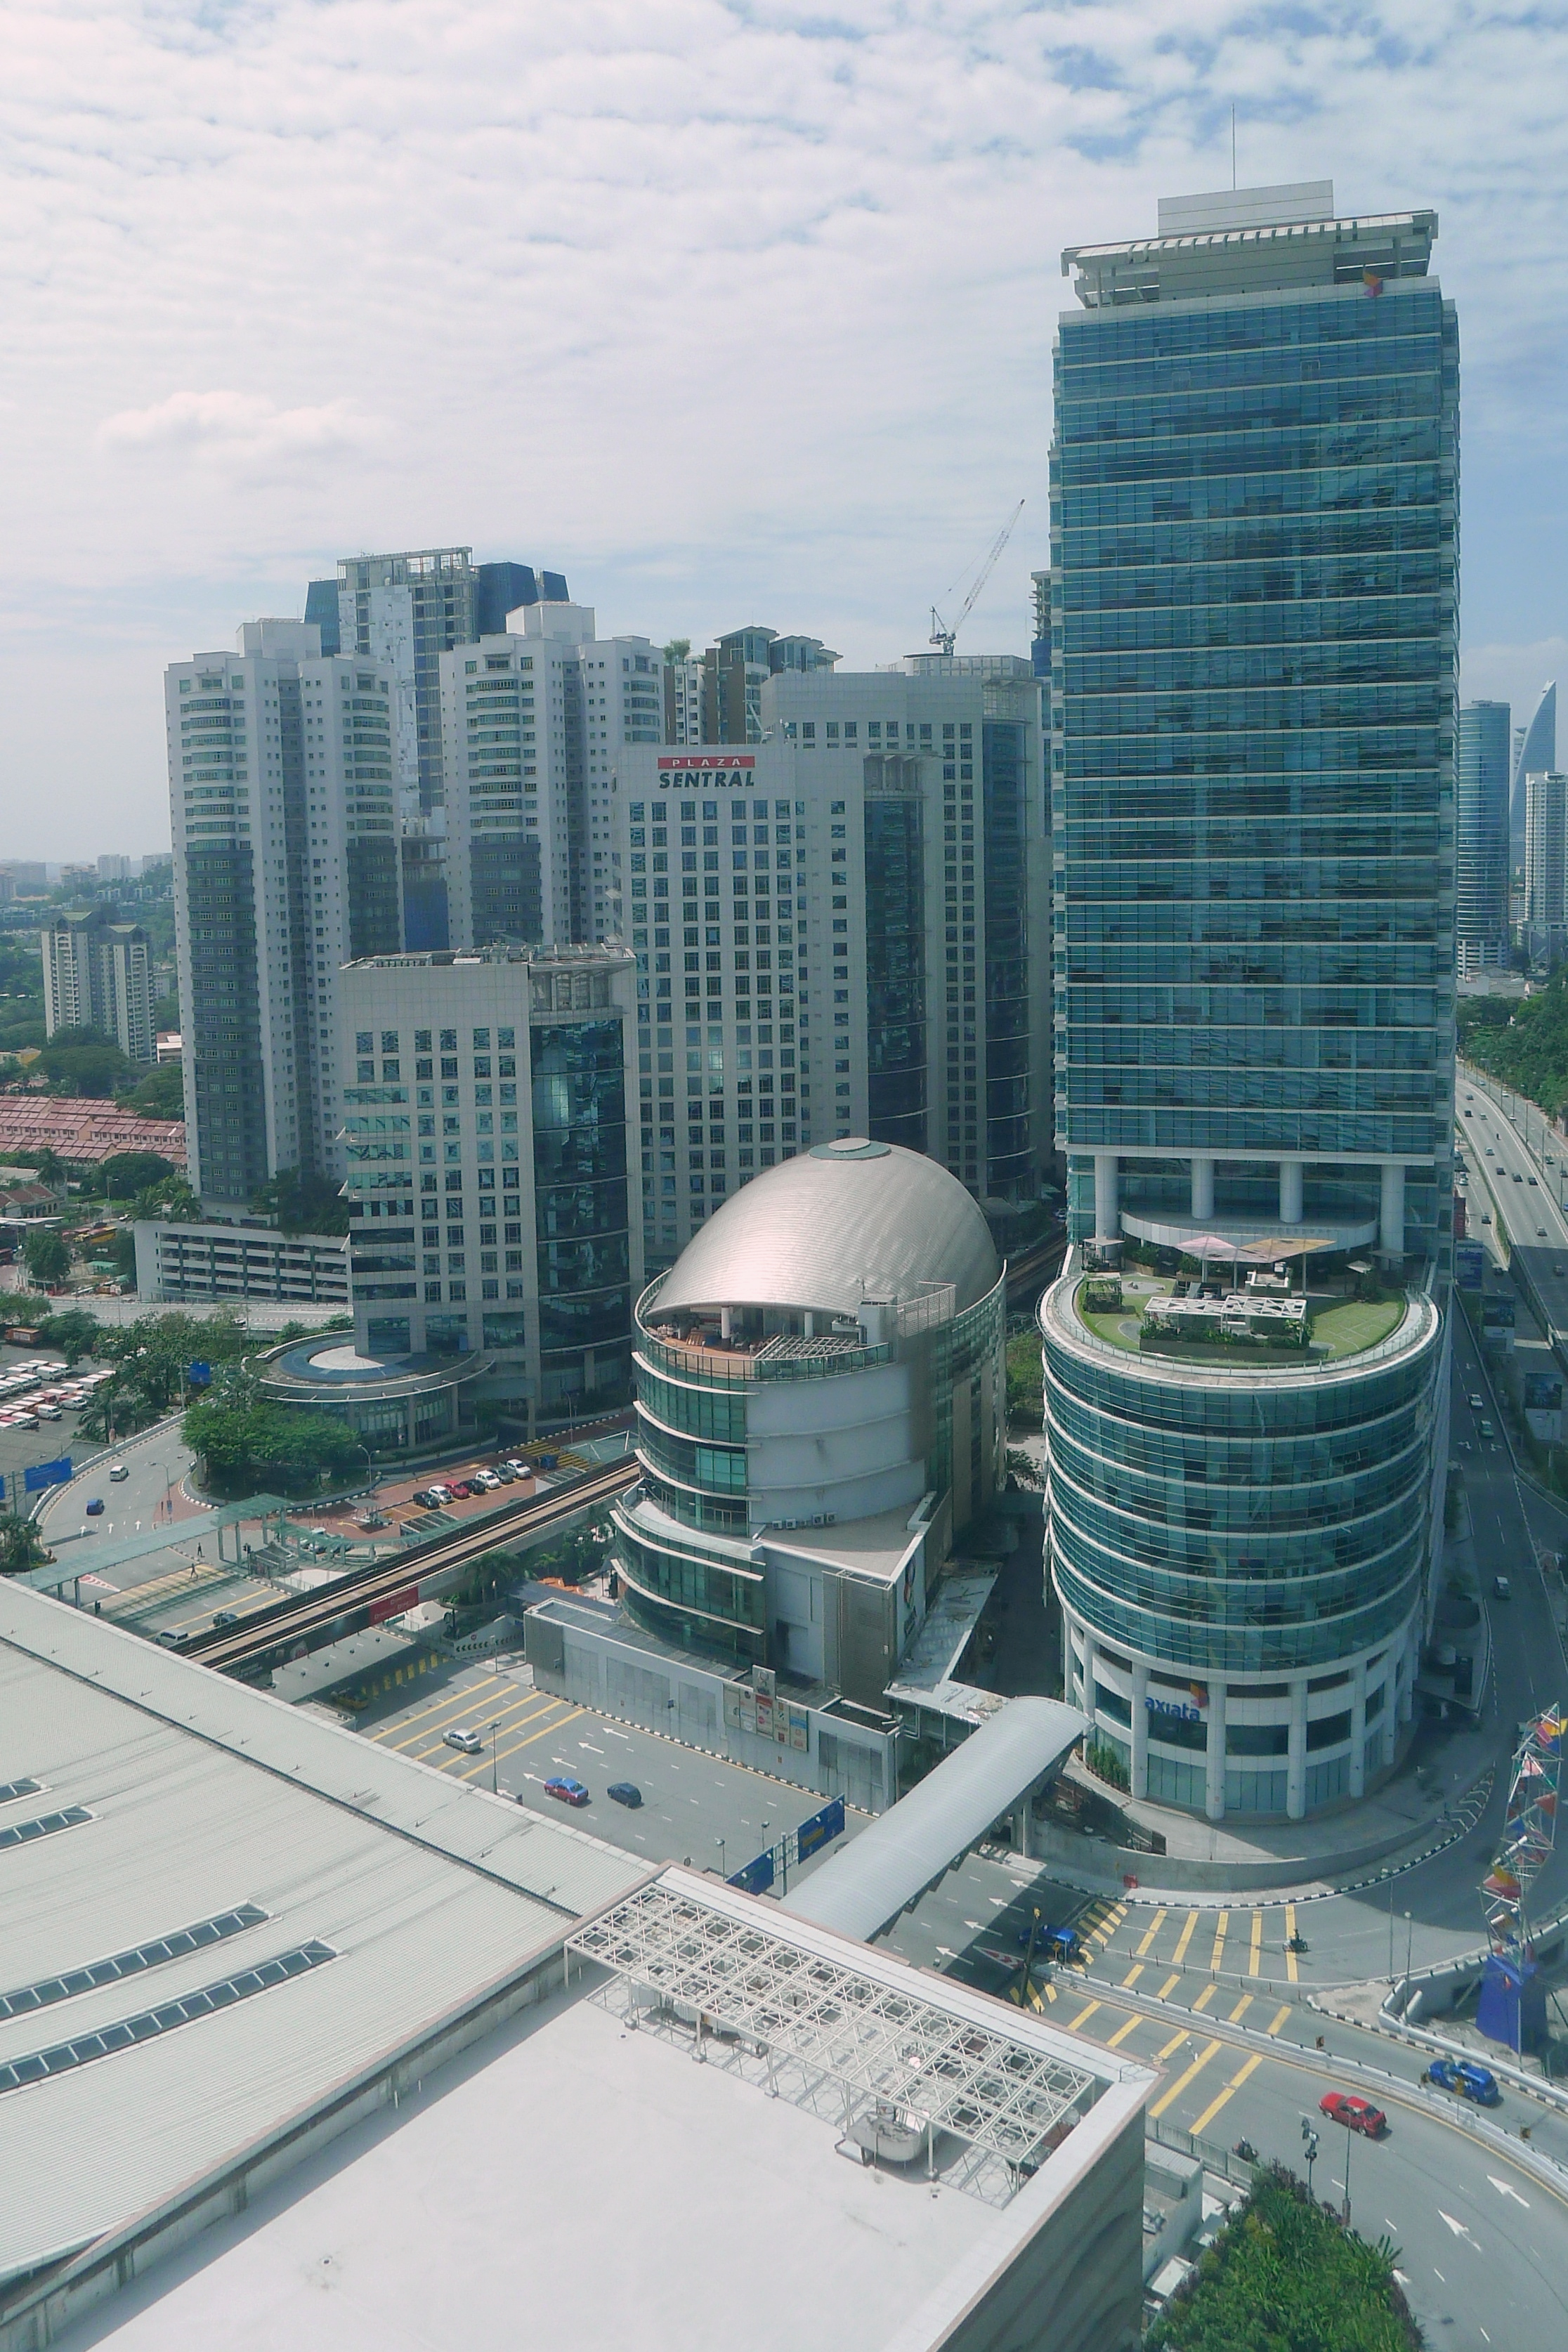 KLIA Ekspres Train - Kuala Lumpur Airport Train